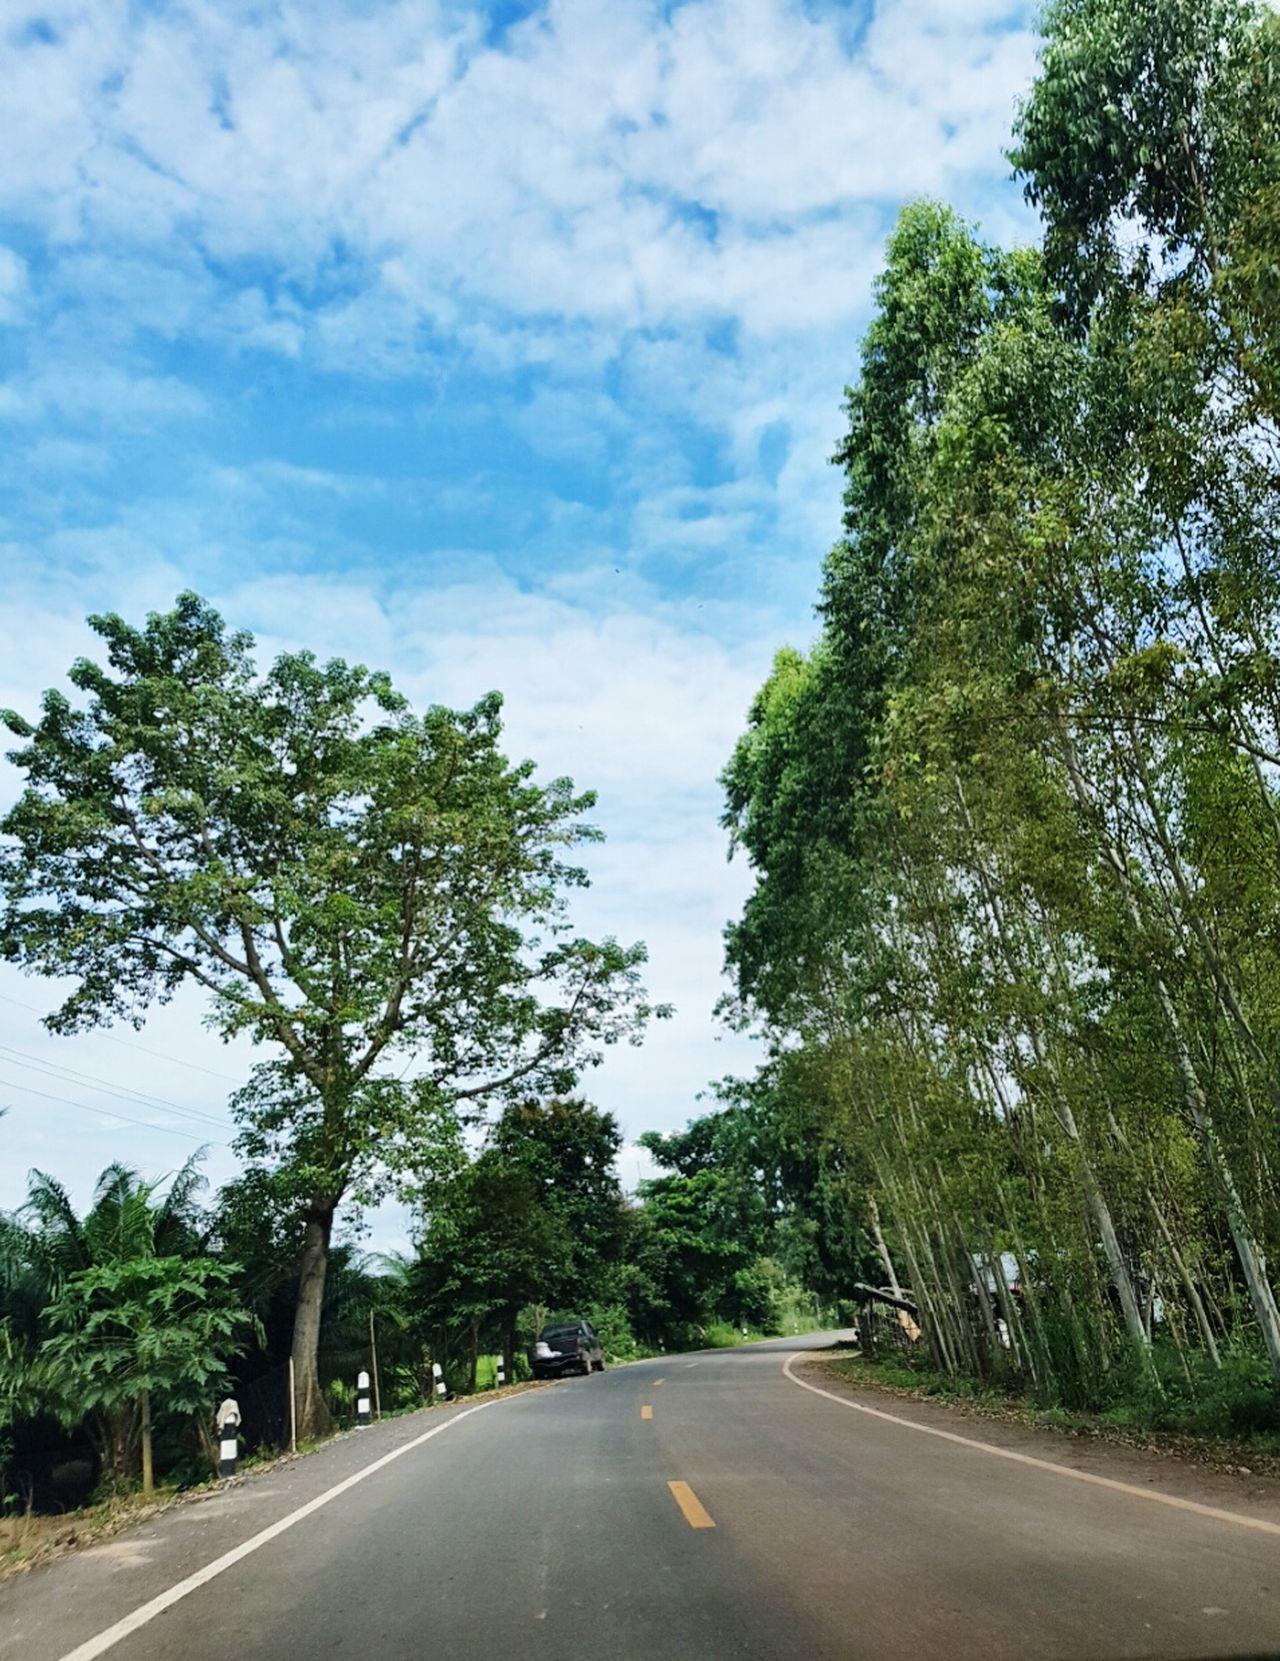 Road Street Tree The Way Forward Sky Nature Outdoors Phone Photography